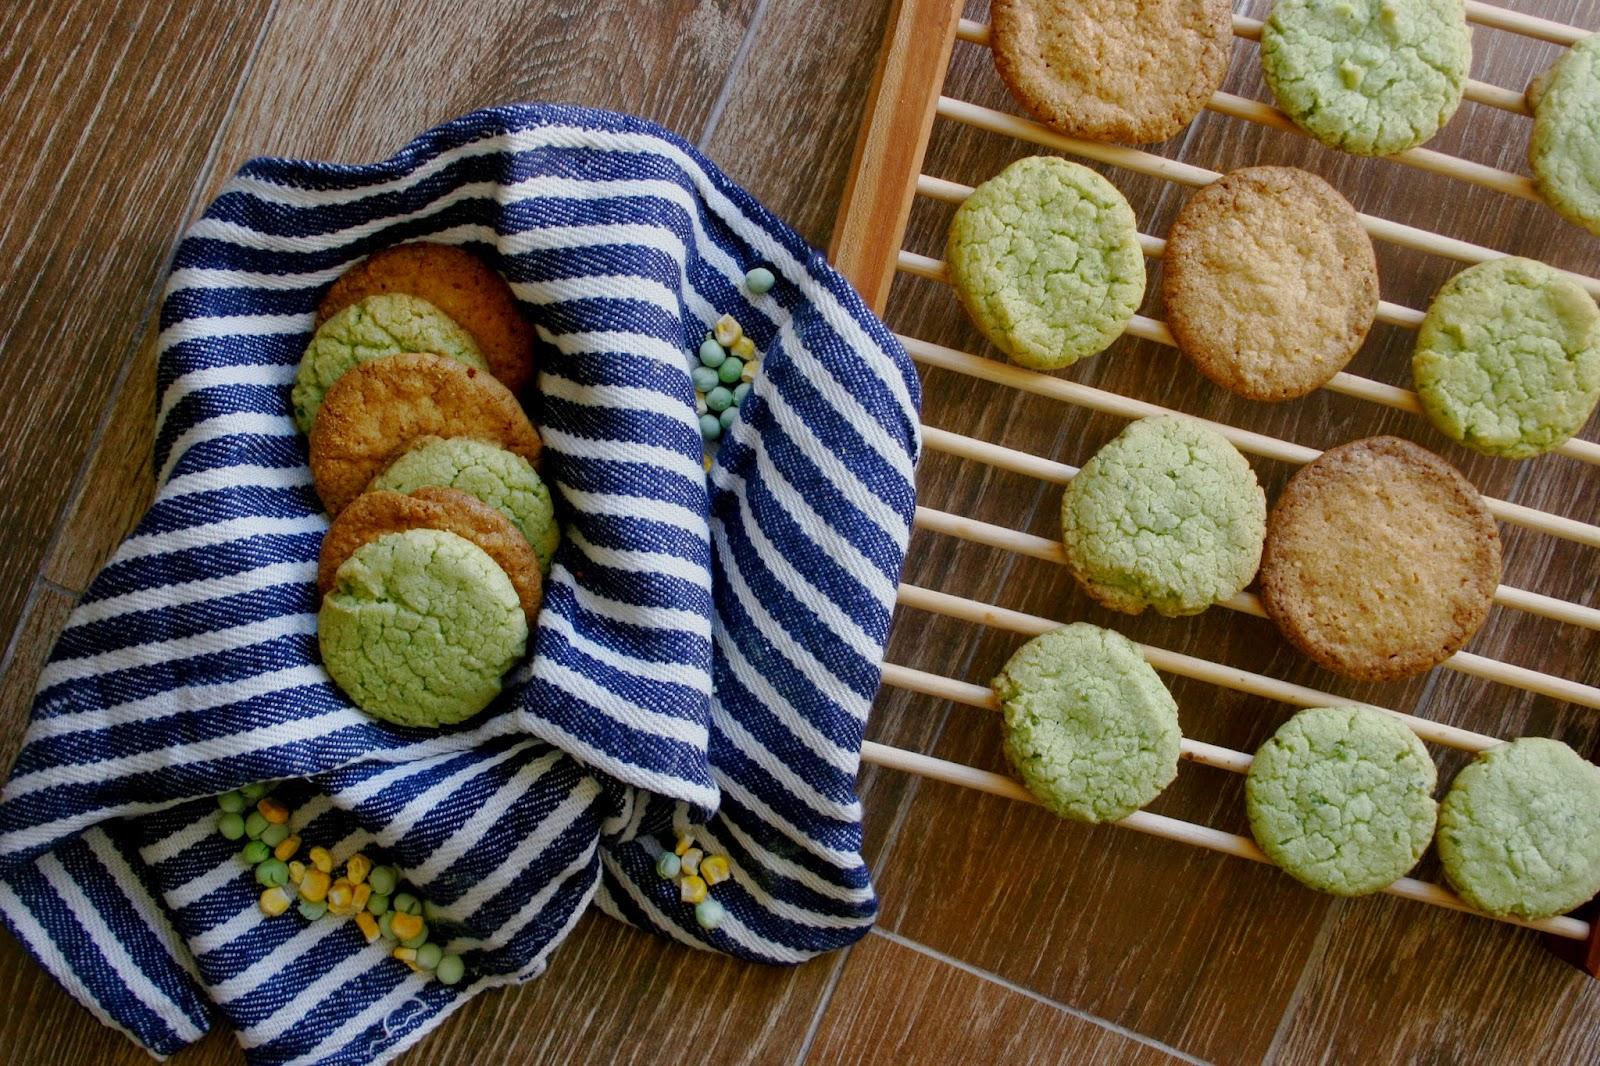 Pea & Corn Cookies